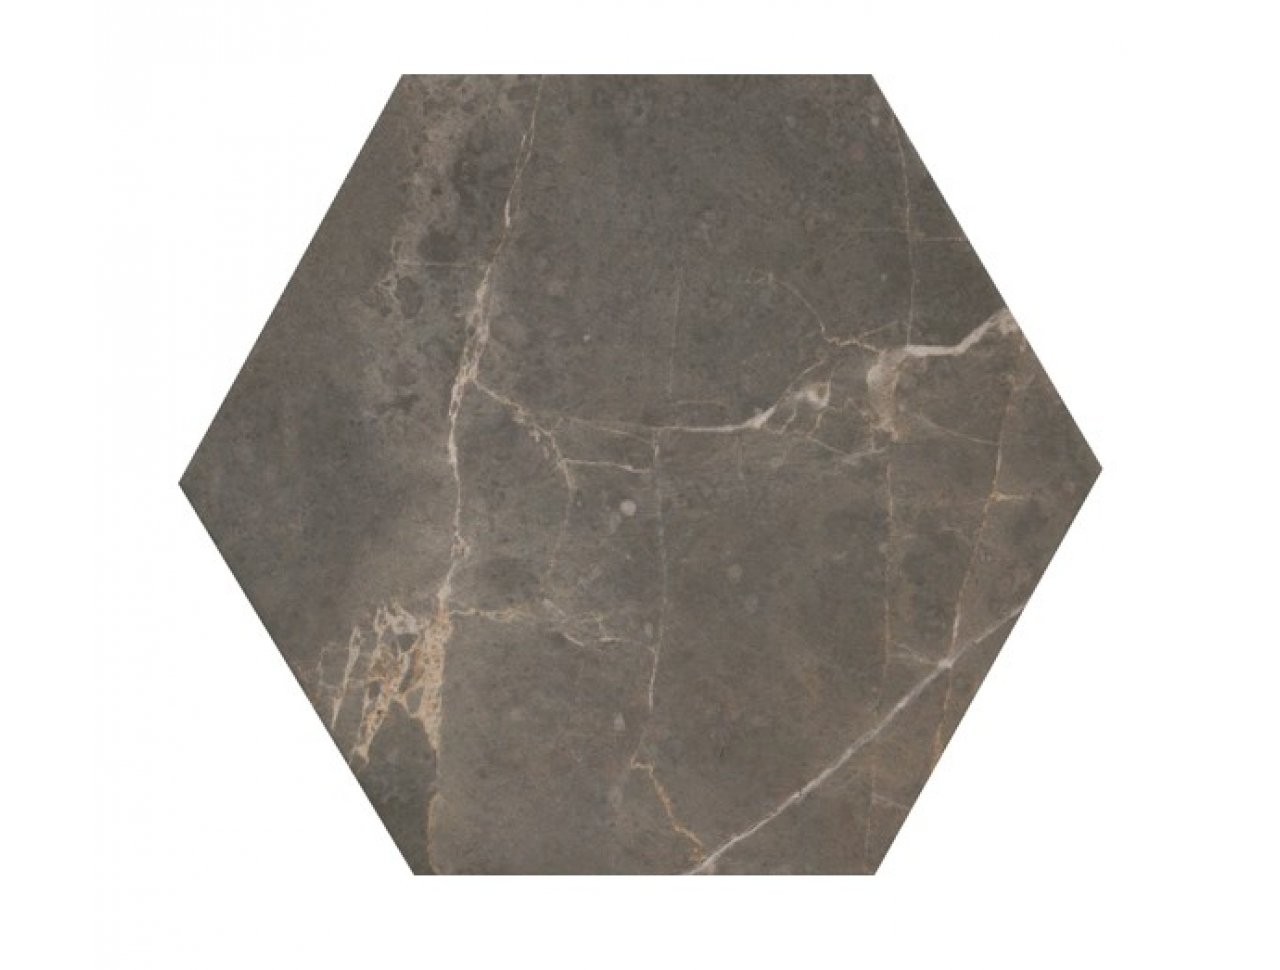 Напольная плитка FAP Roma Imperiale Esagono 21.6 x 25 см, Арт. fLVC